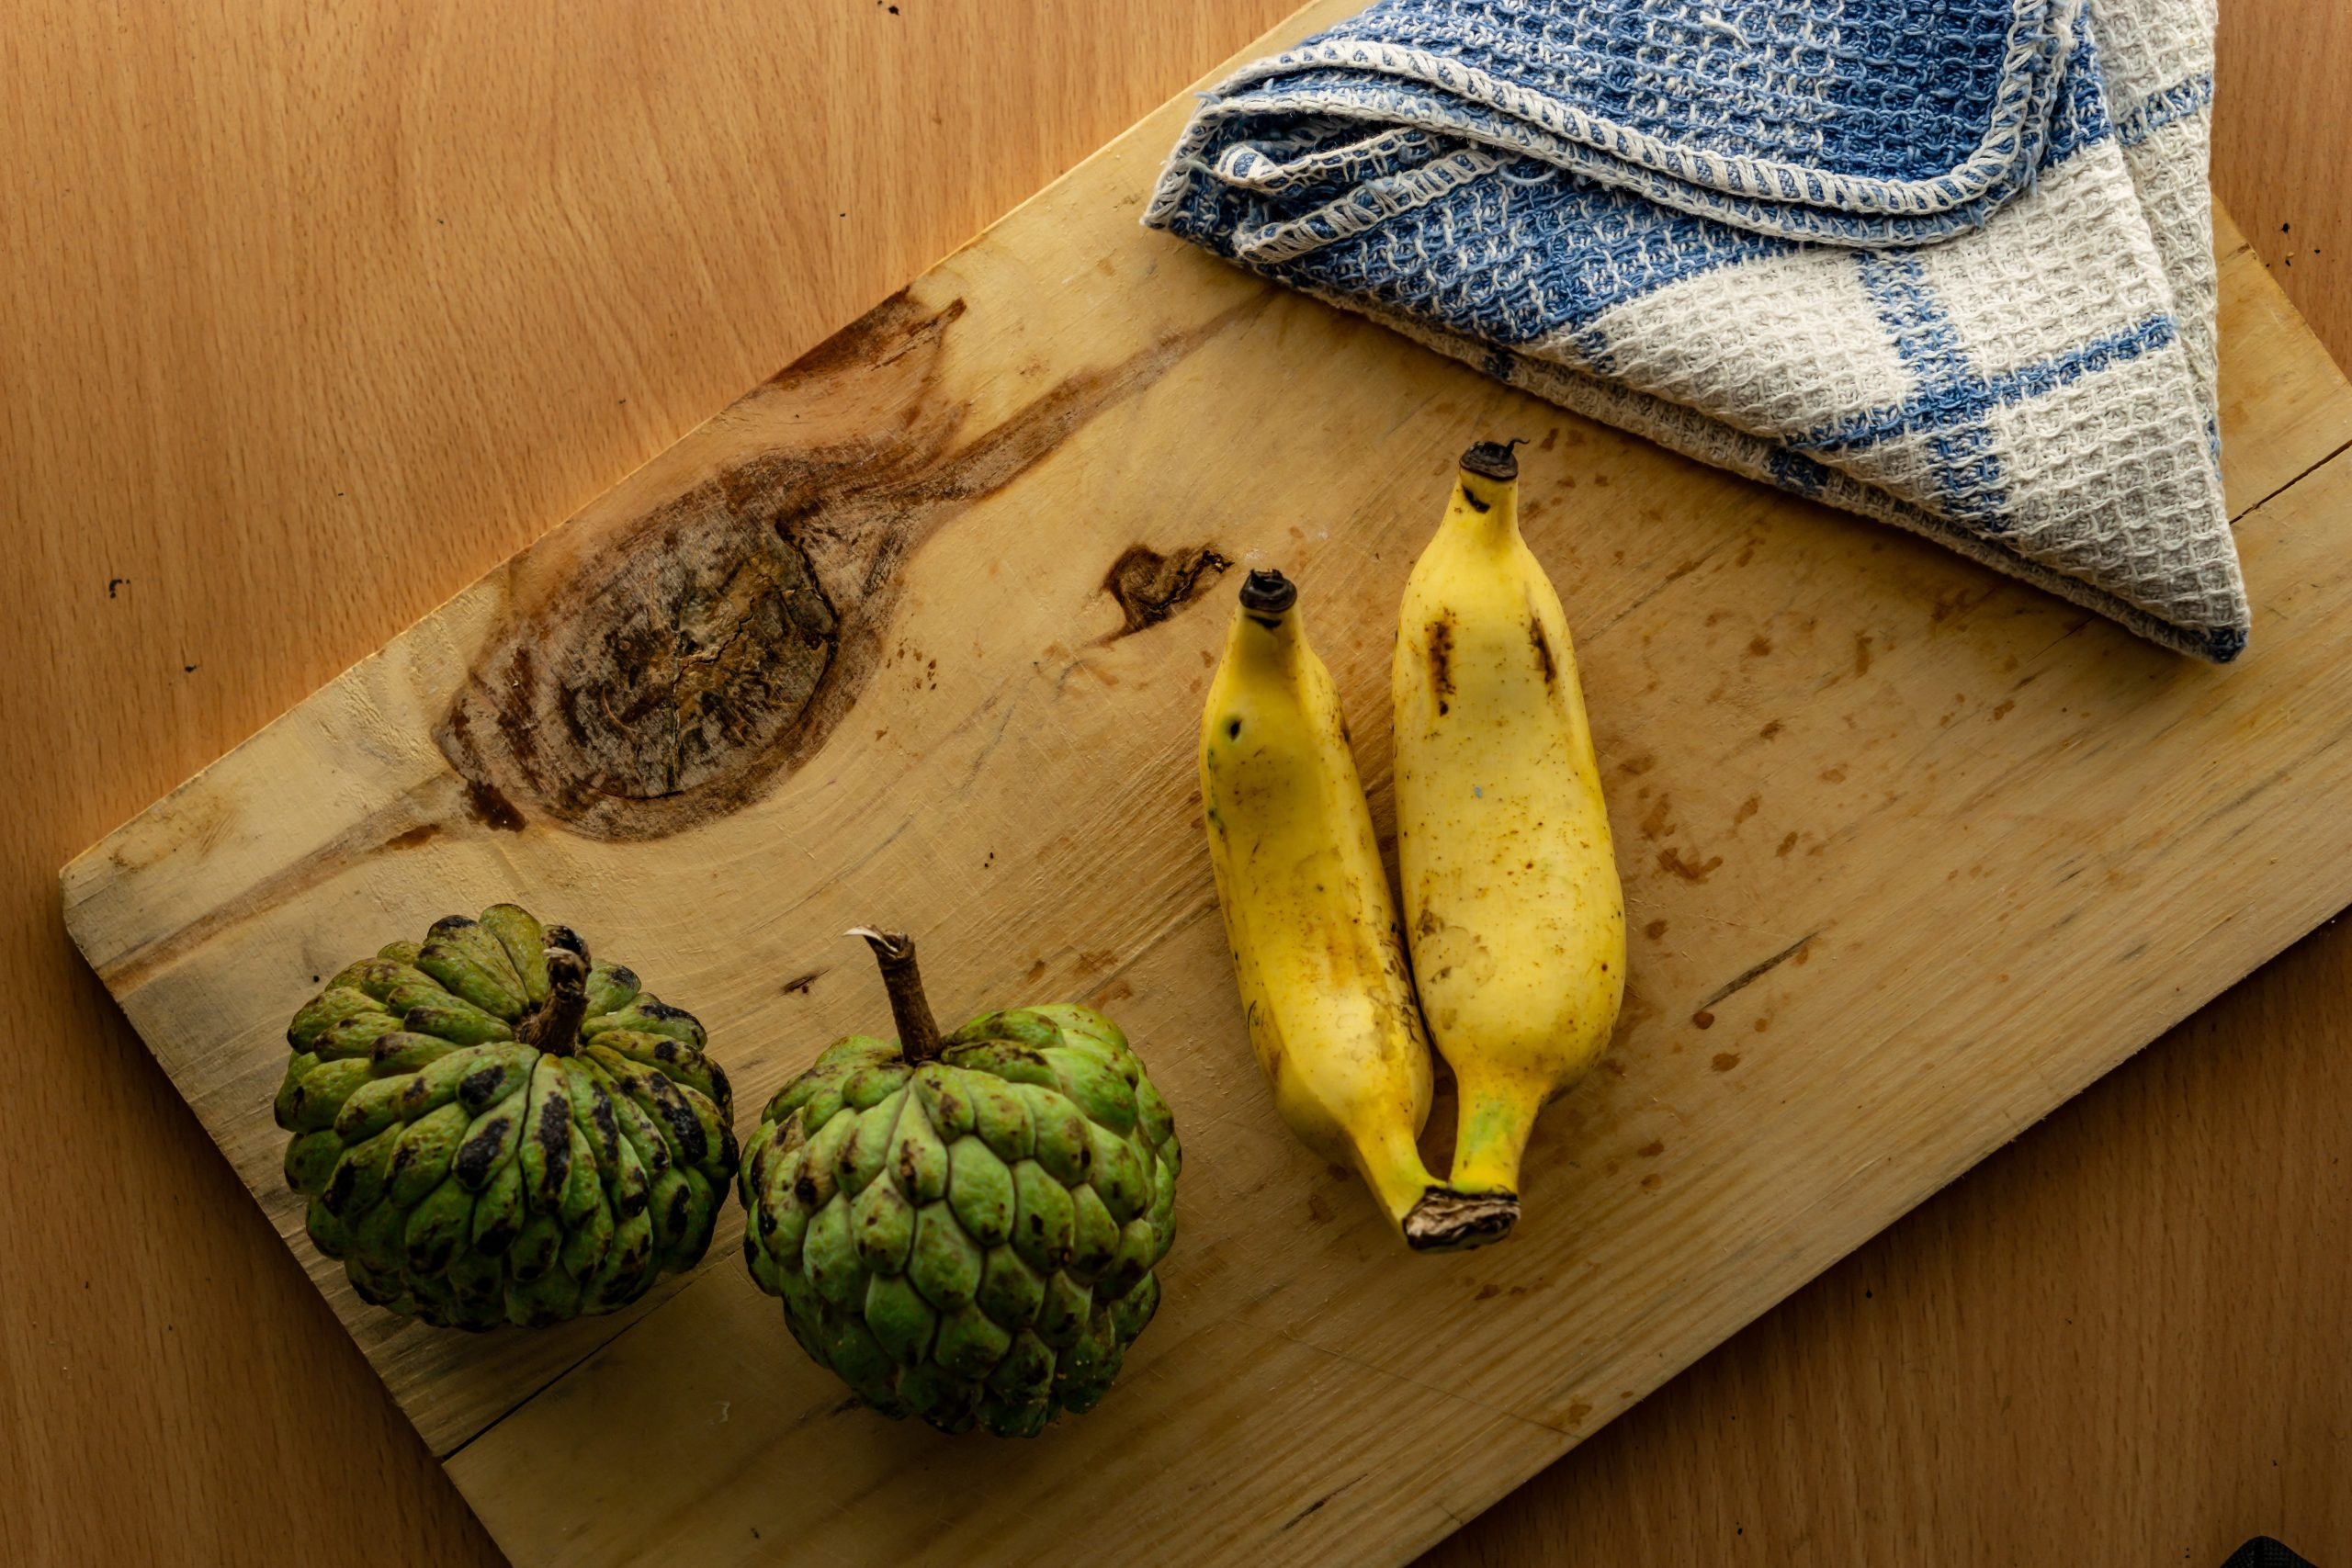 Custard apple and banana fruit as a healthy diet